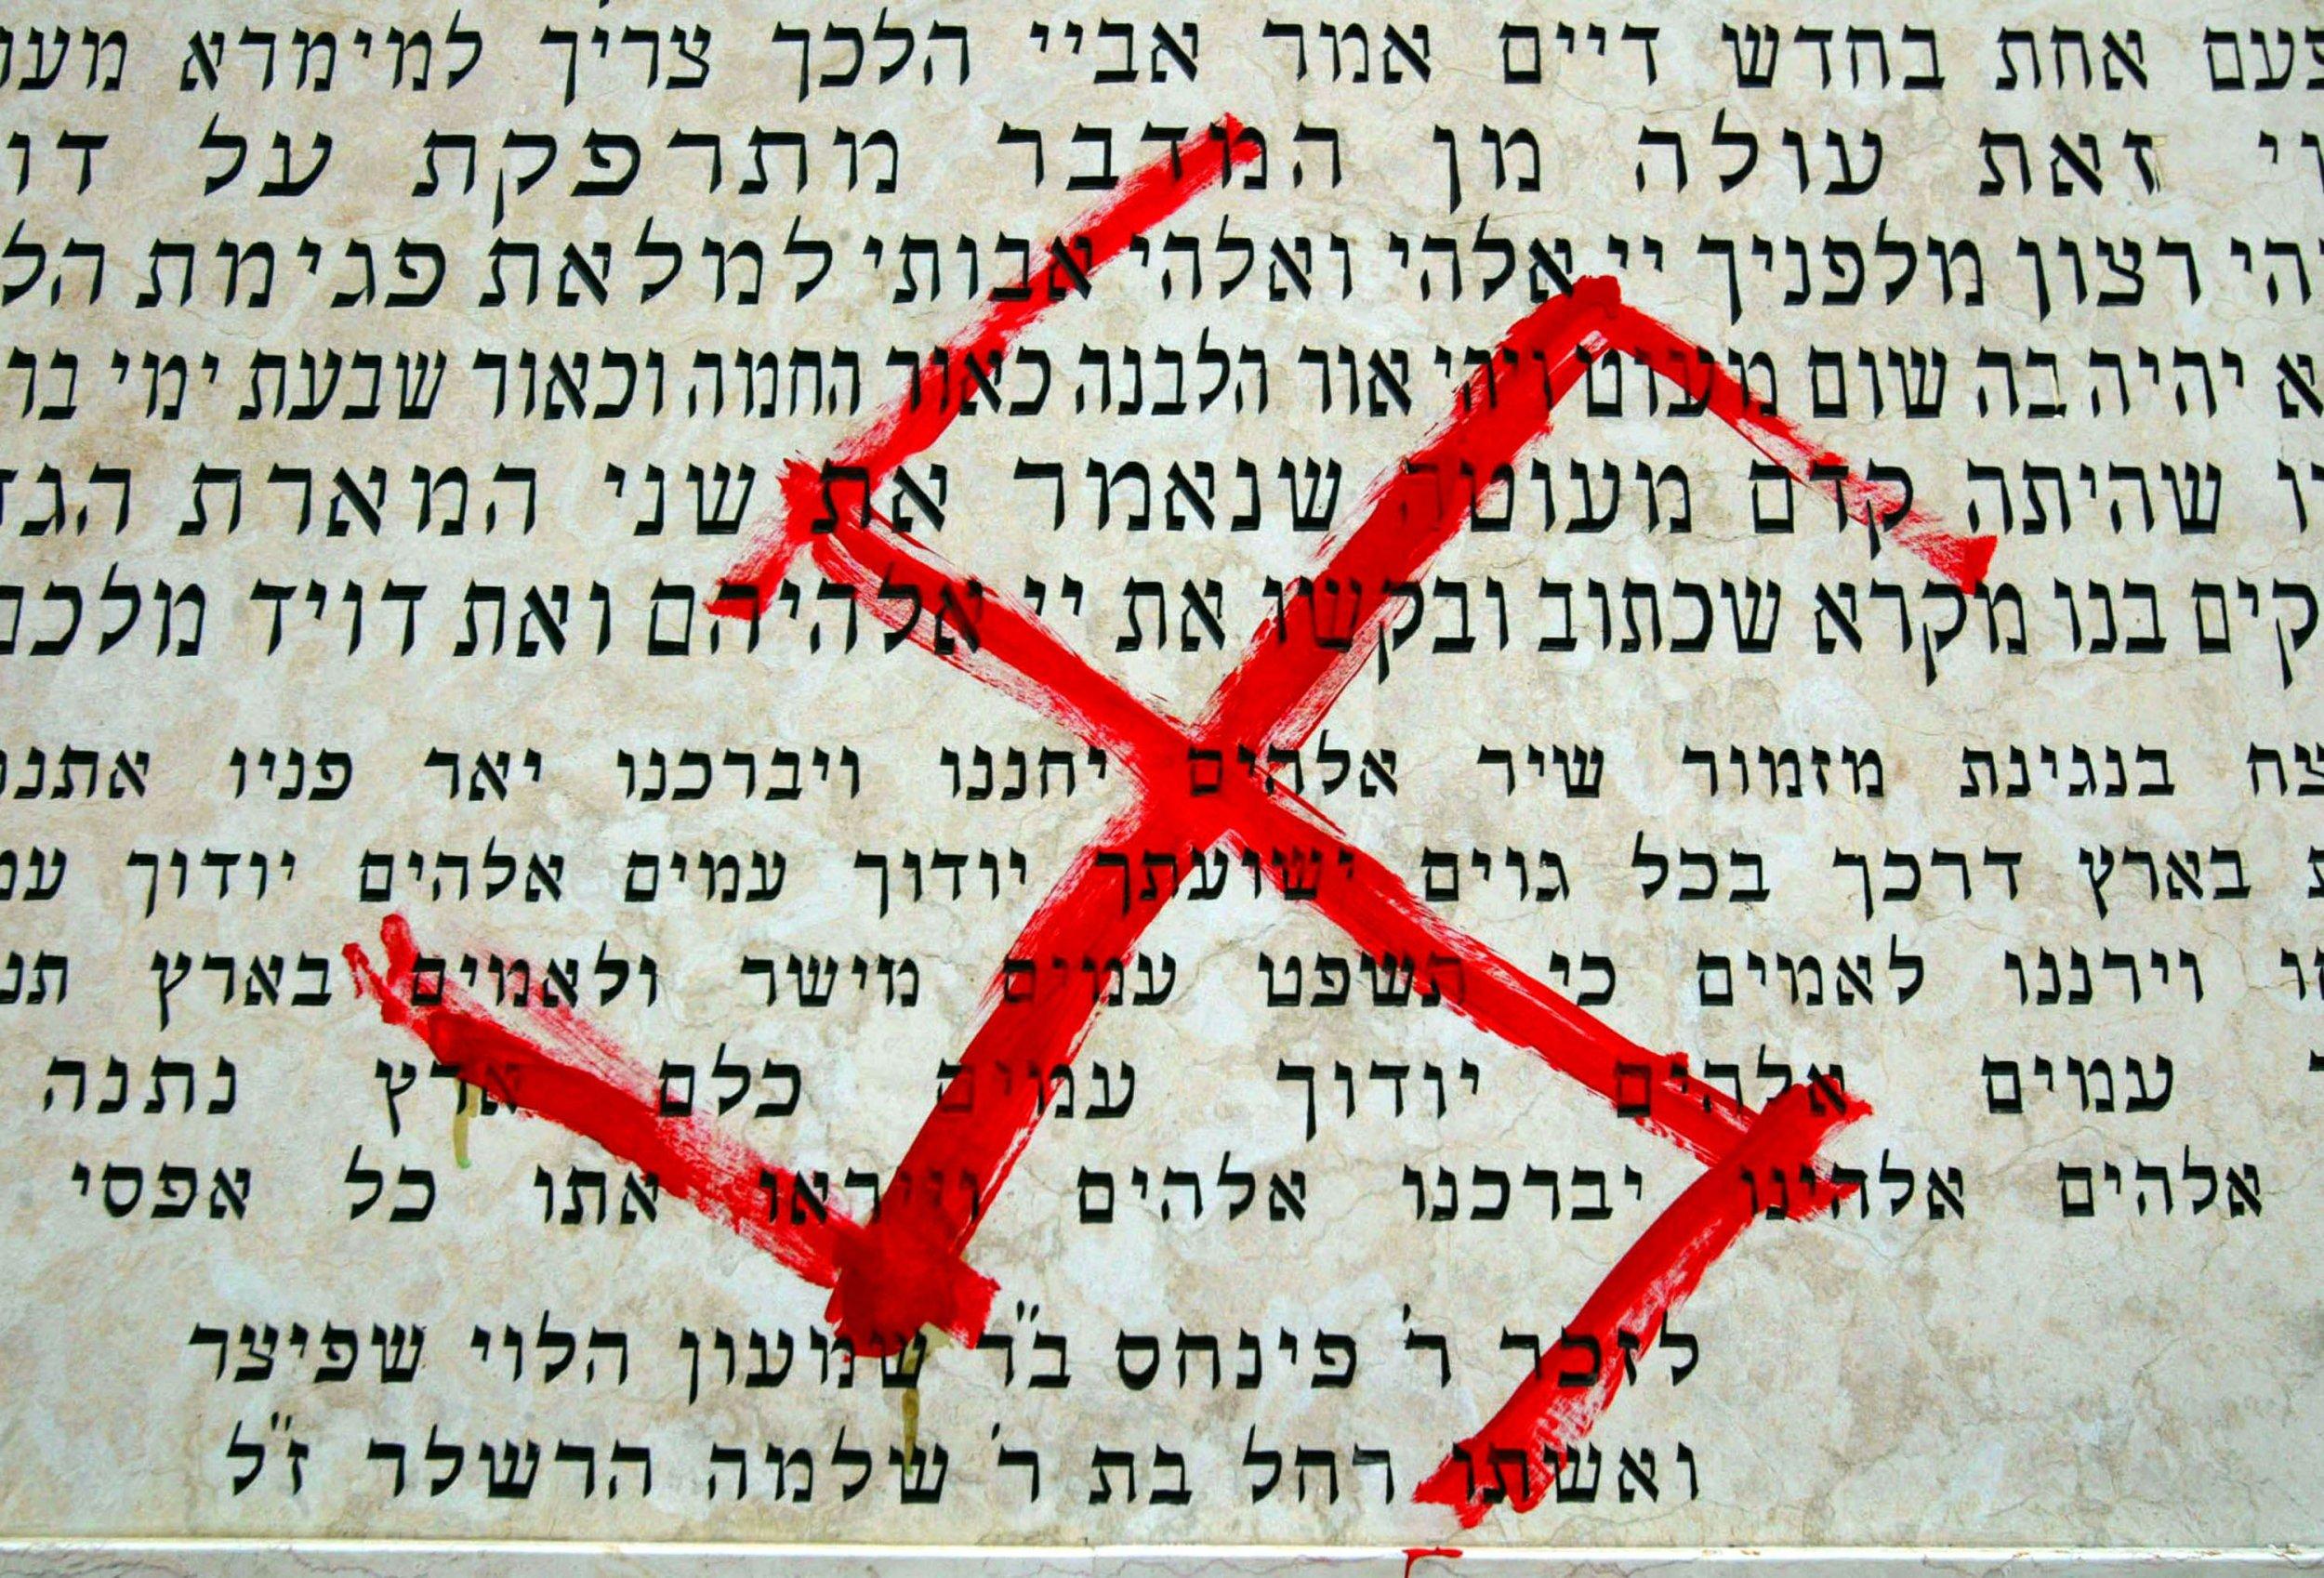 swastika federal crime charged synagogue